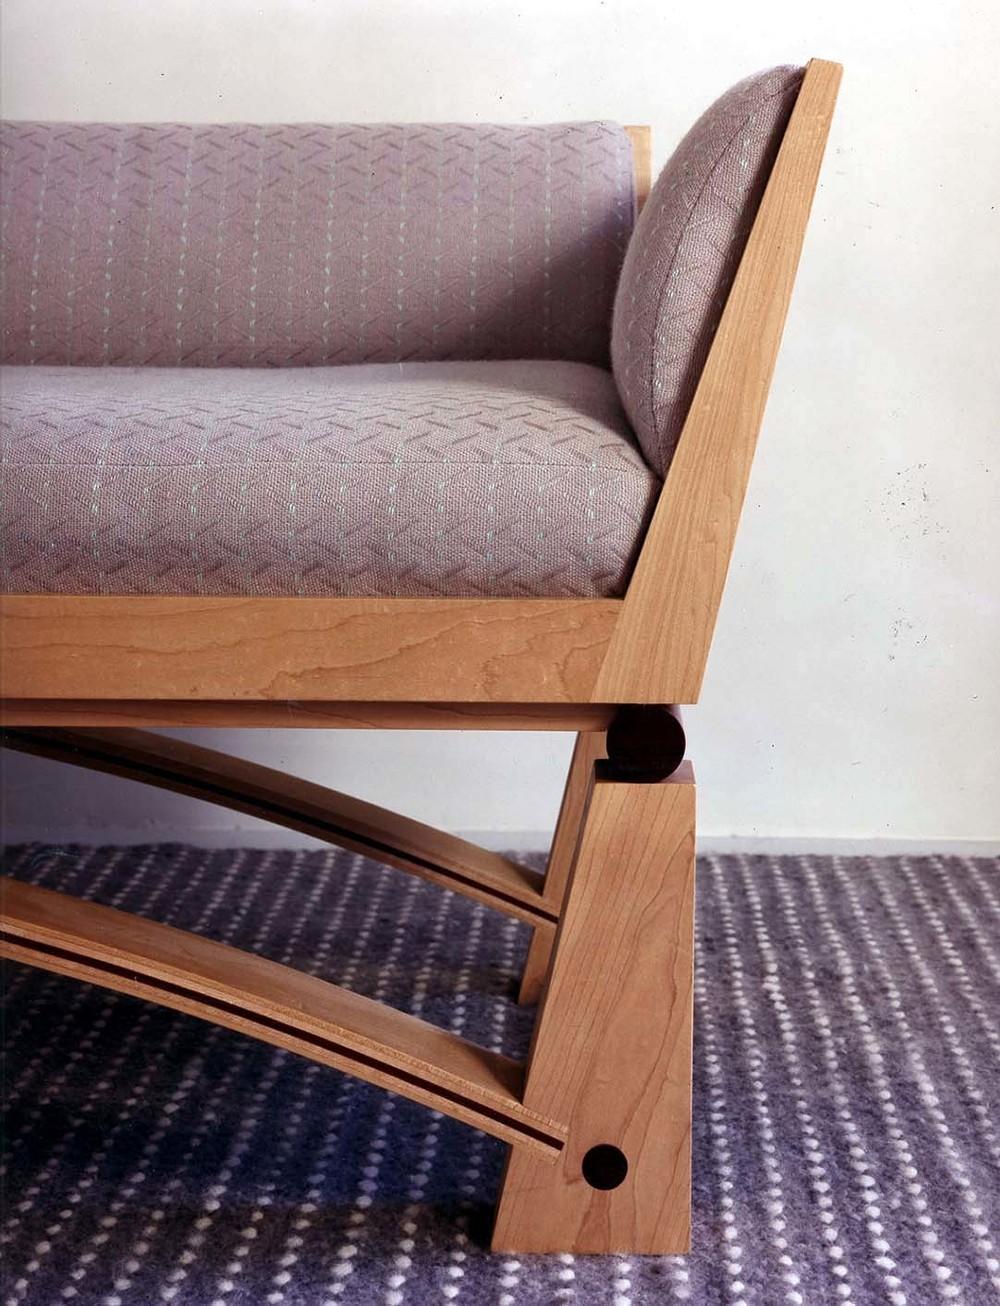 furniture2.jpg